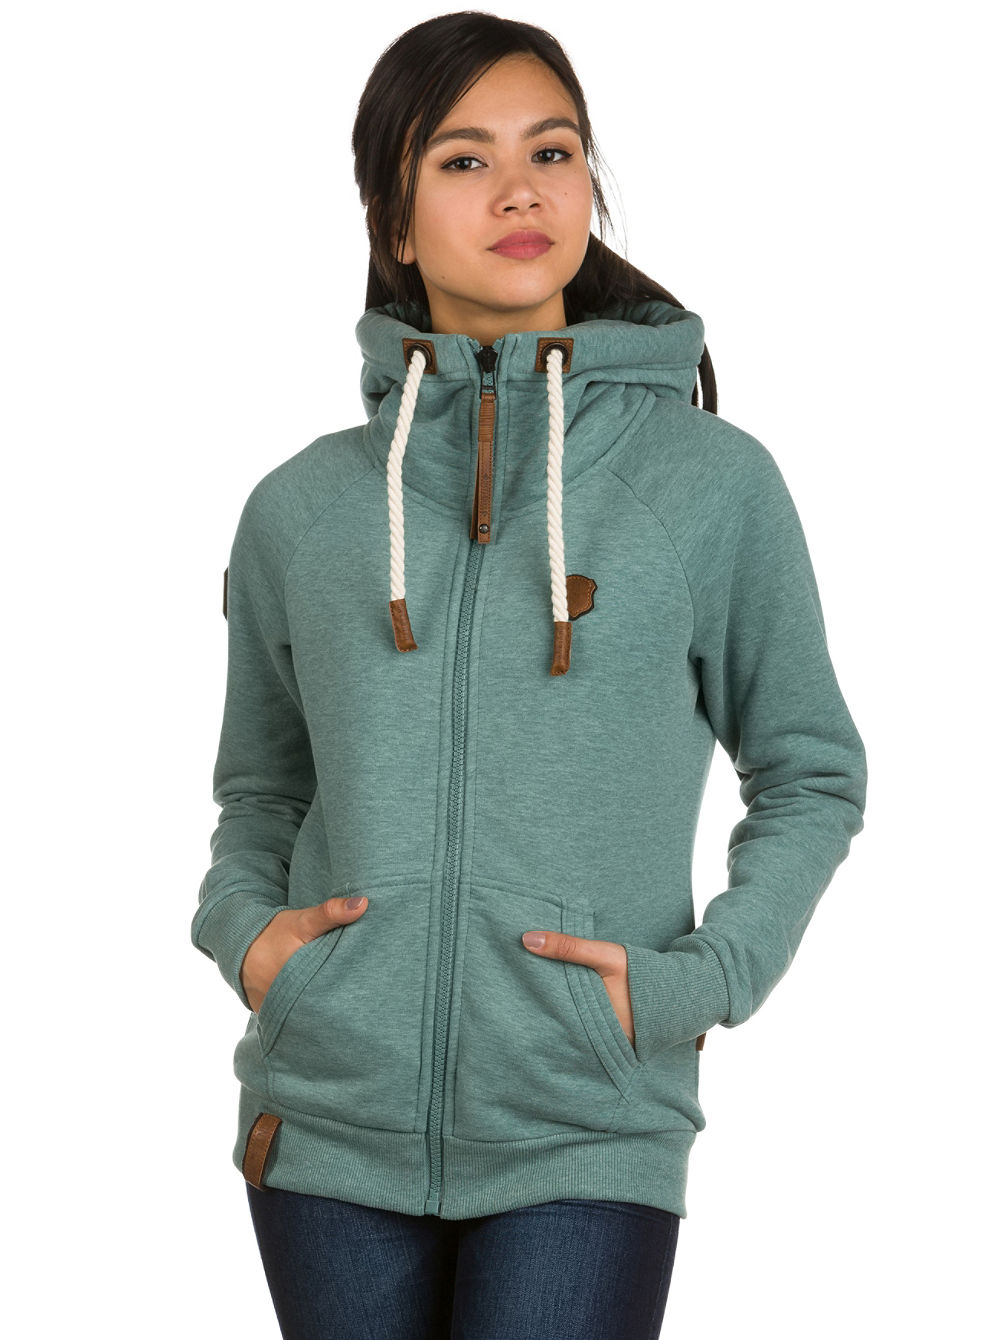 kup naketano brazzo ix zip hoodie online na blue. Black Bedroom Furniture Sets. Home Design Ideas